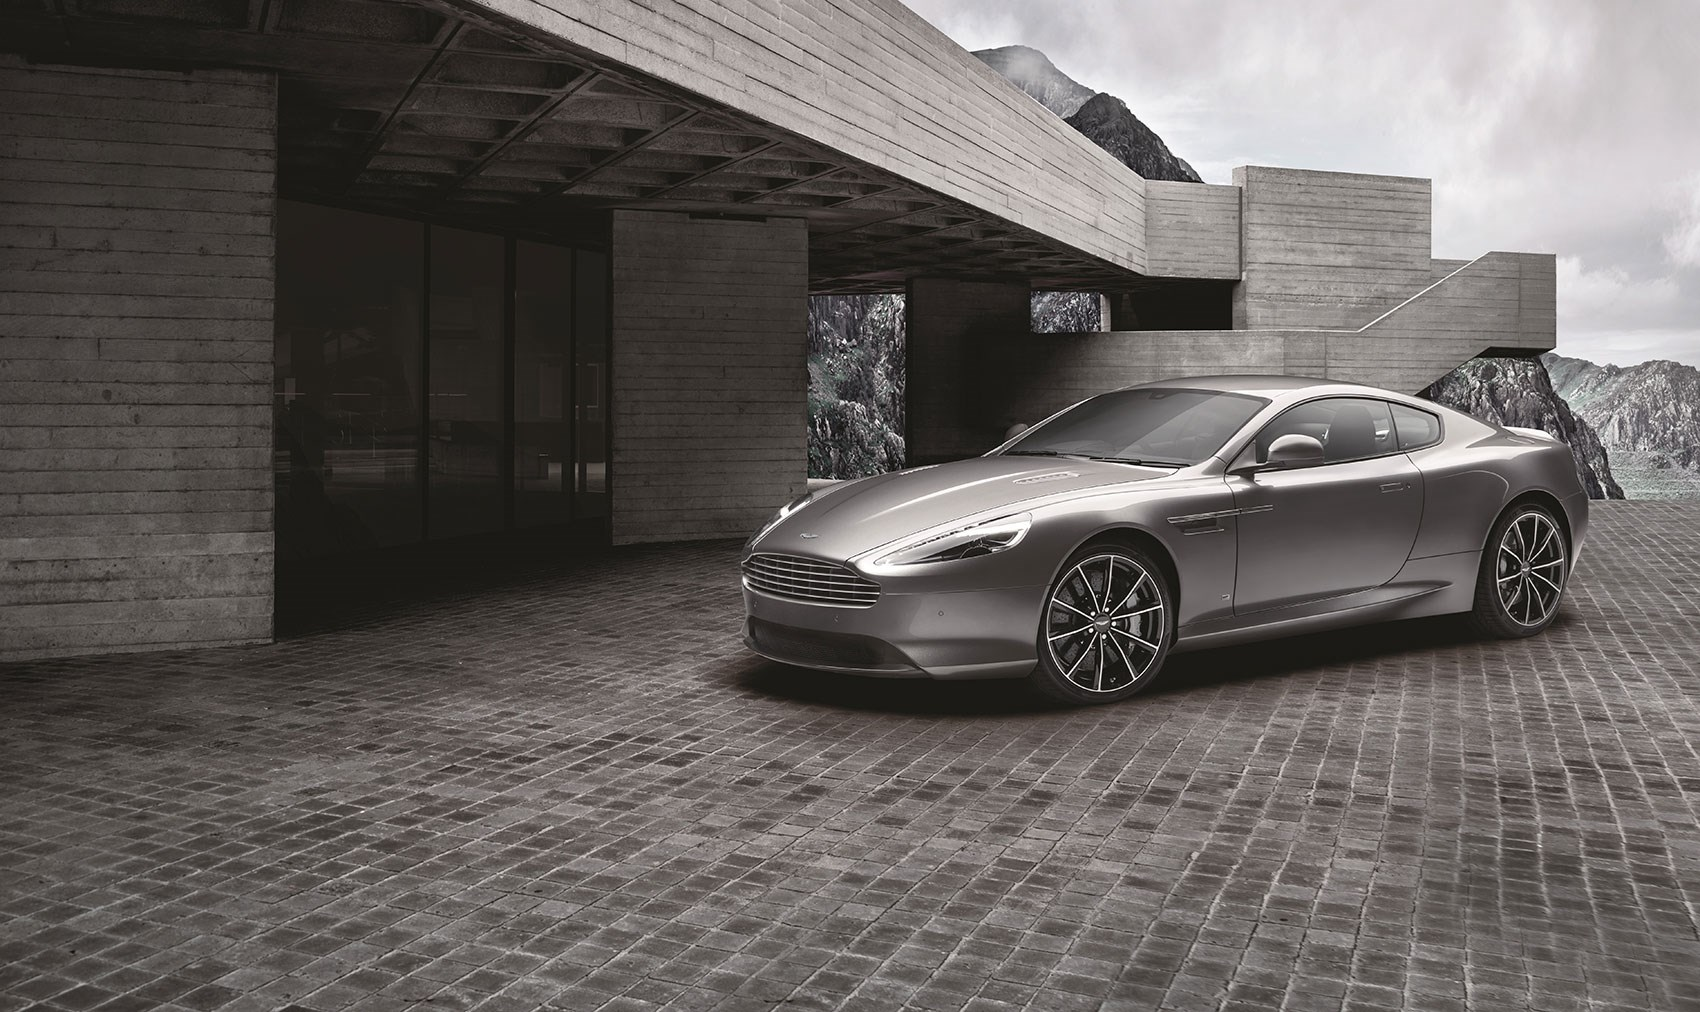 Aston Martin S First 007 Car Db9 Gt Bond Edition We Ve Been